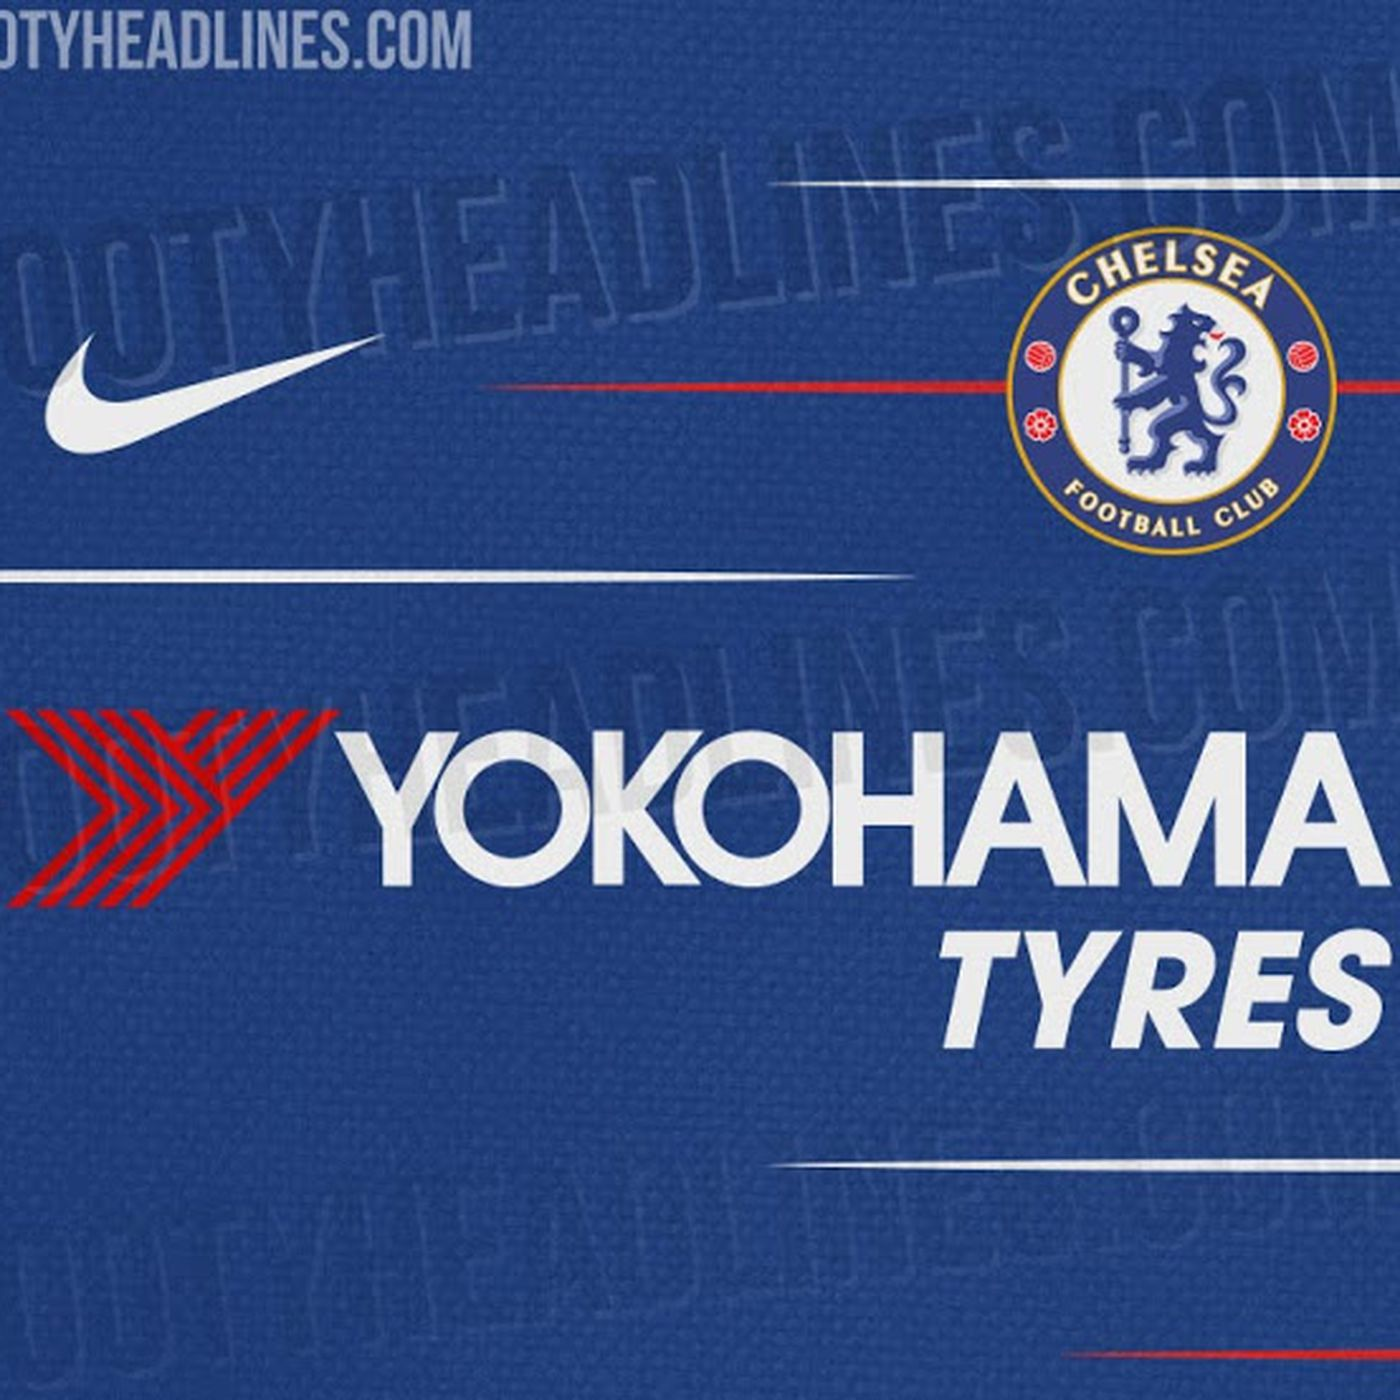 sale retailer 9d98a e7ffe Kit leak: Nike 2018-19 Chelsea home shirt set to have more ...